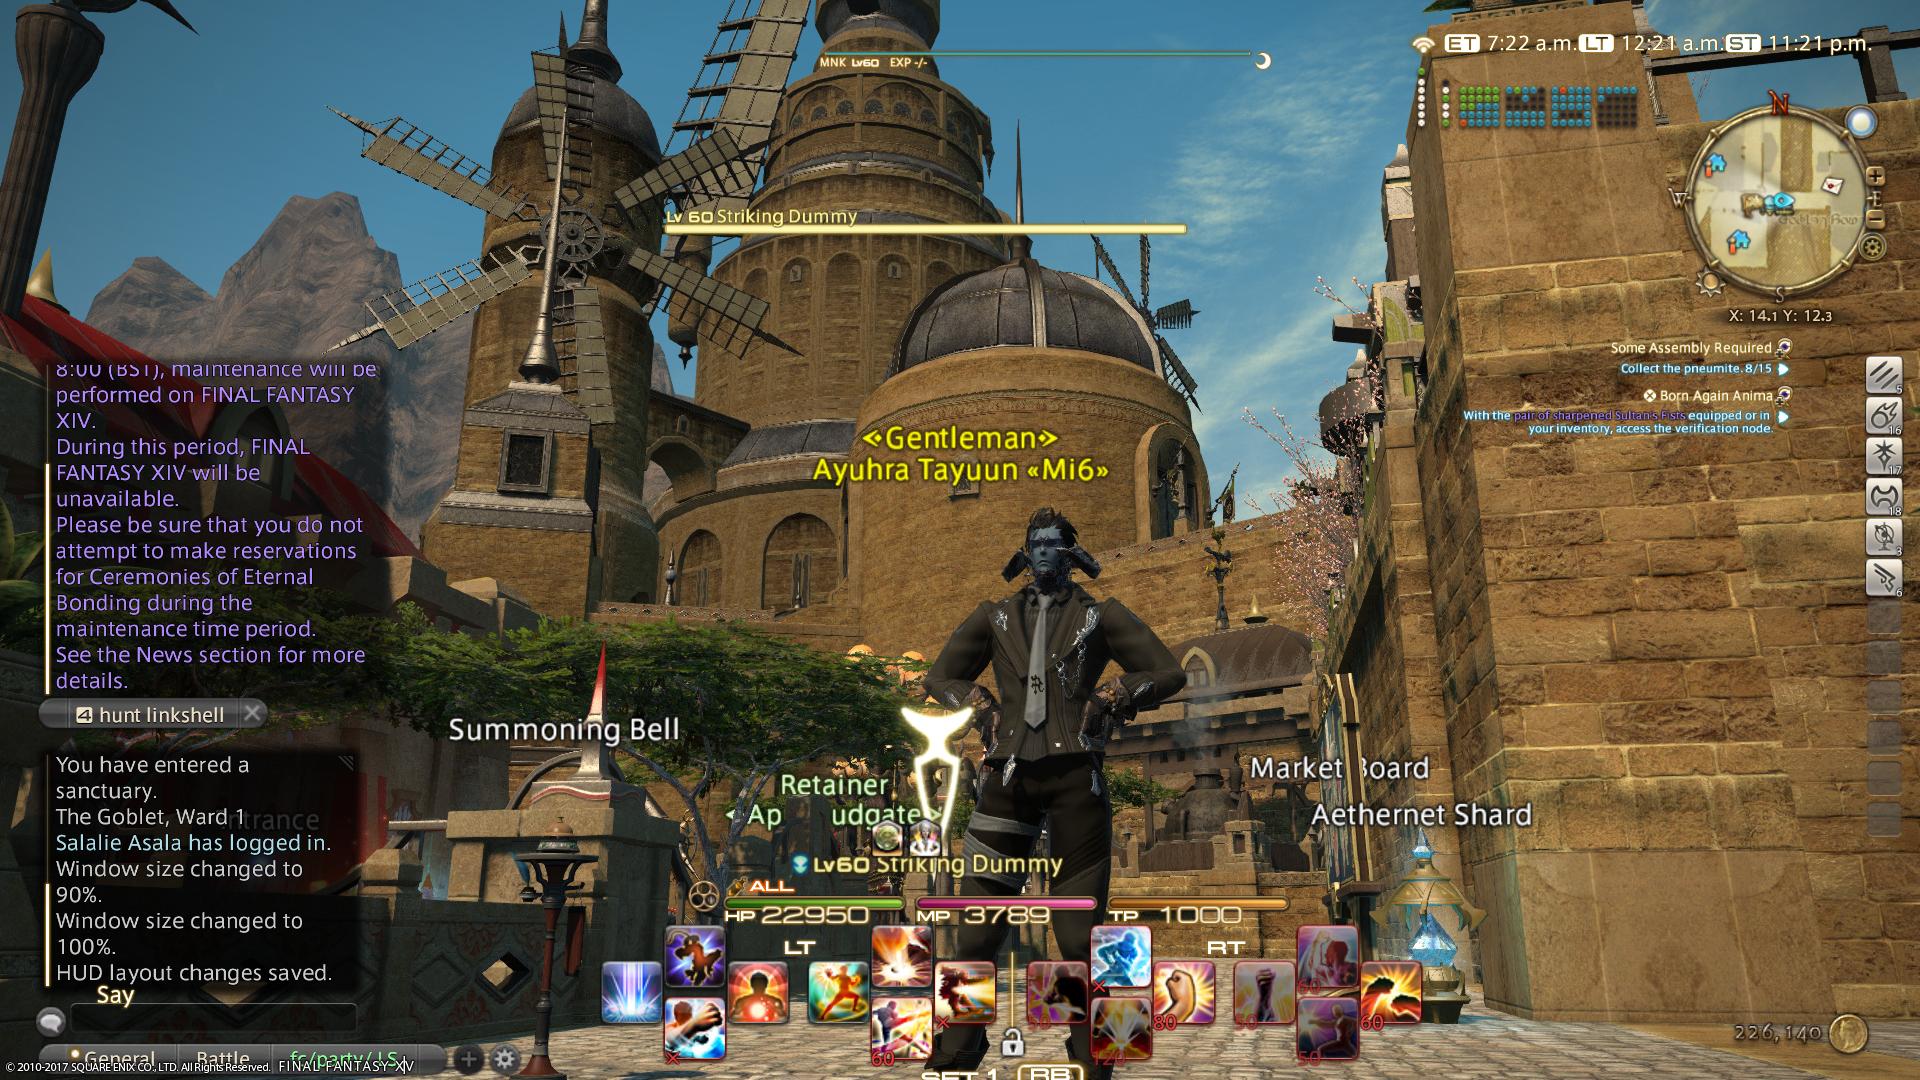 Final Fantasy XIV: Heavensward |OT2| RIP Bowmage 2015-2017  | NeoGAF